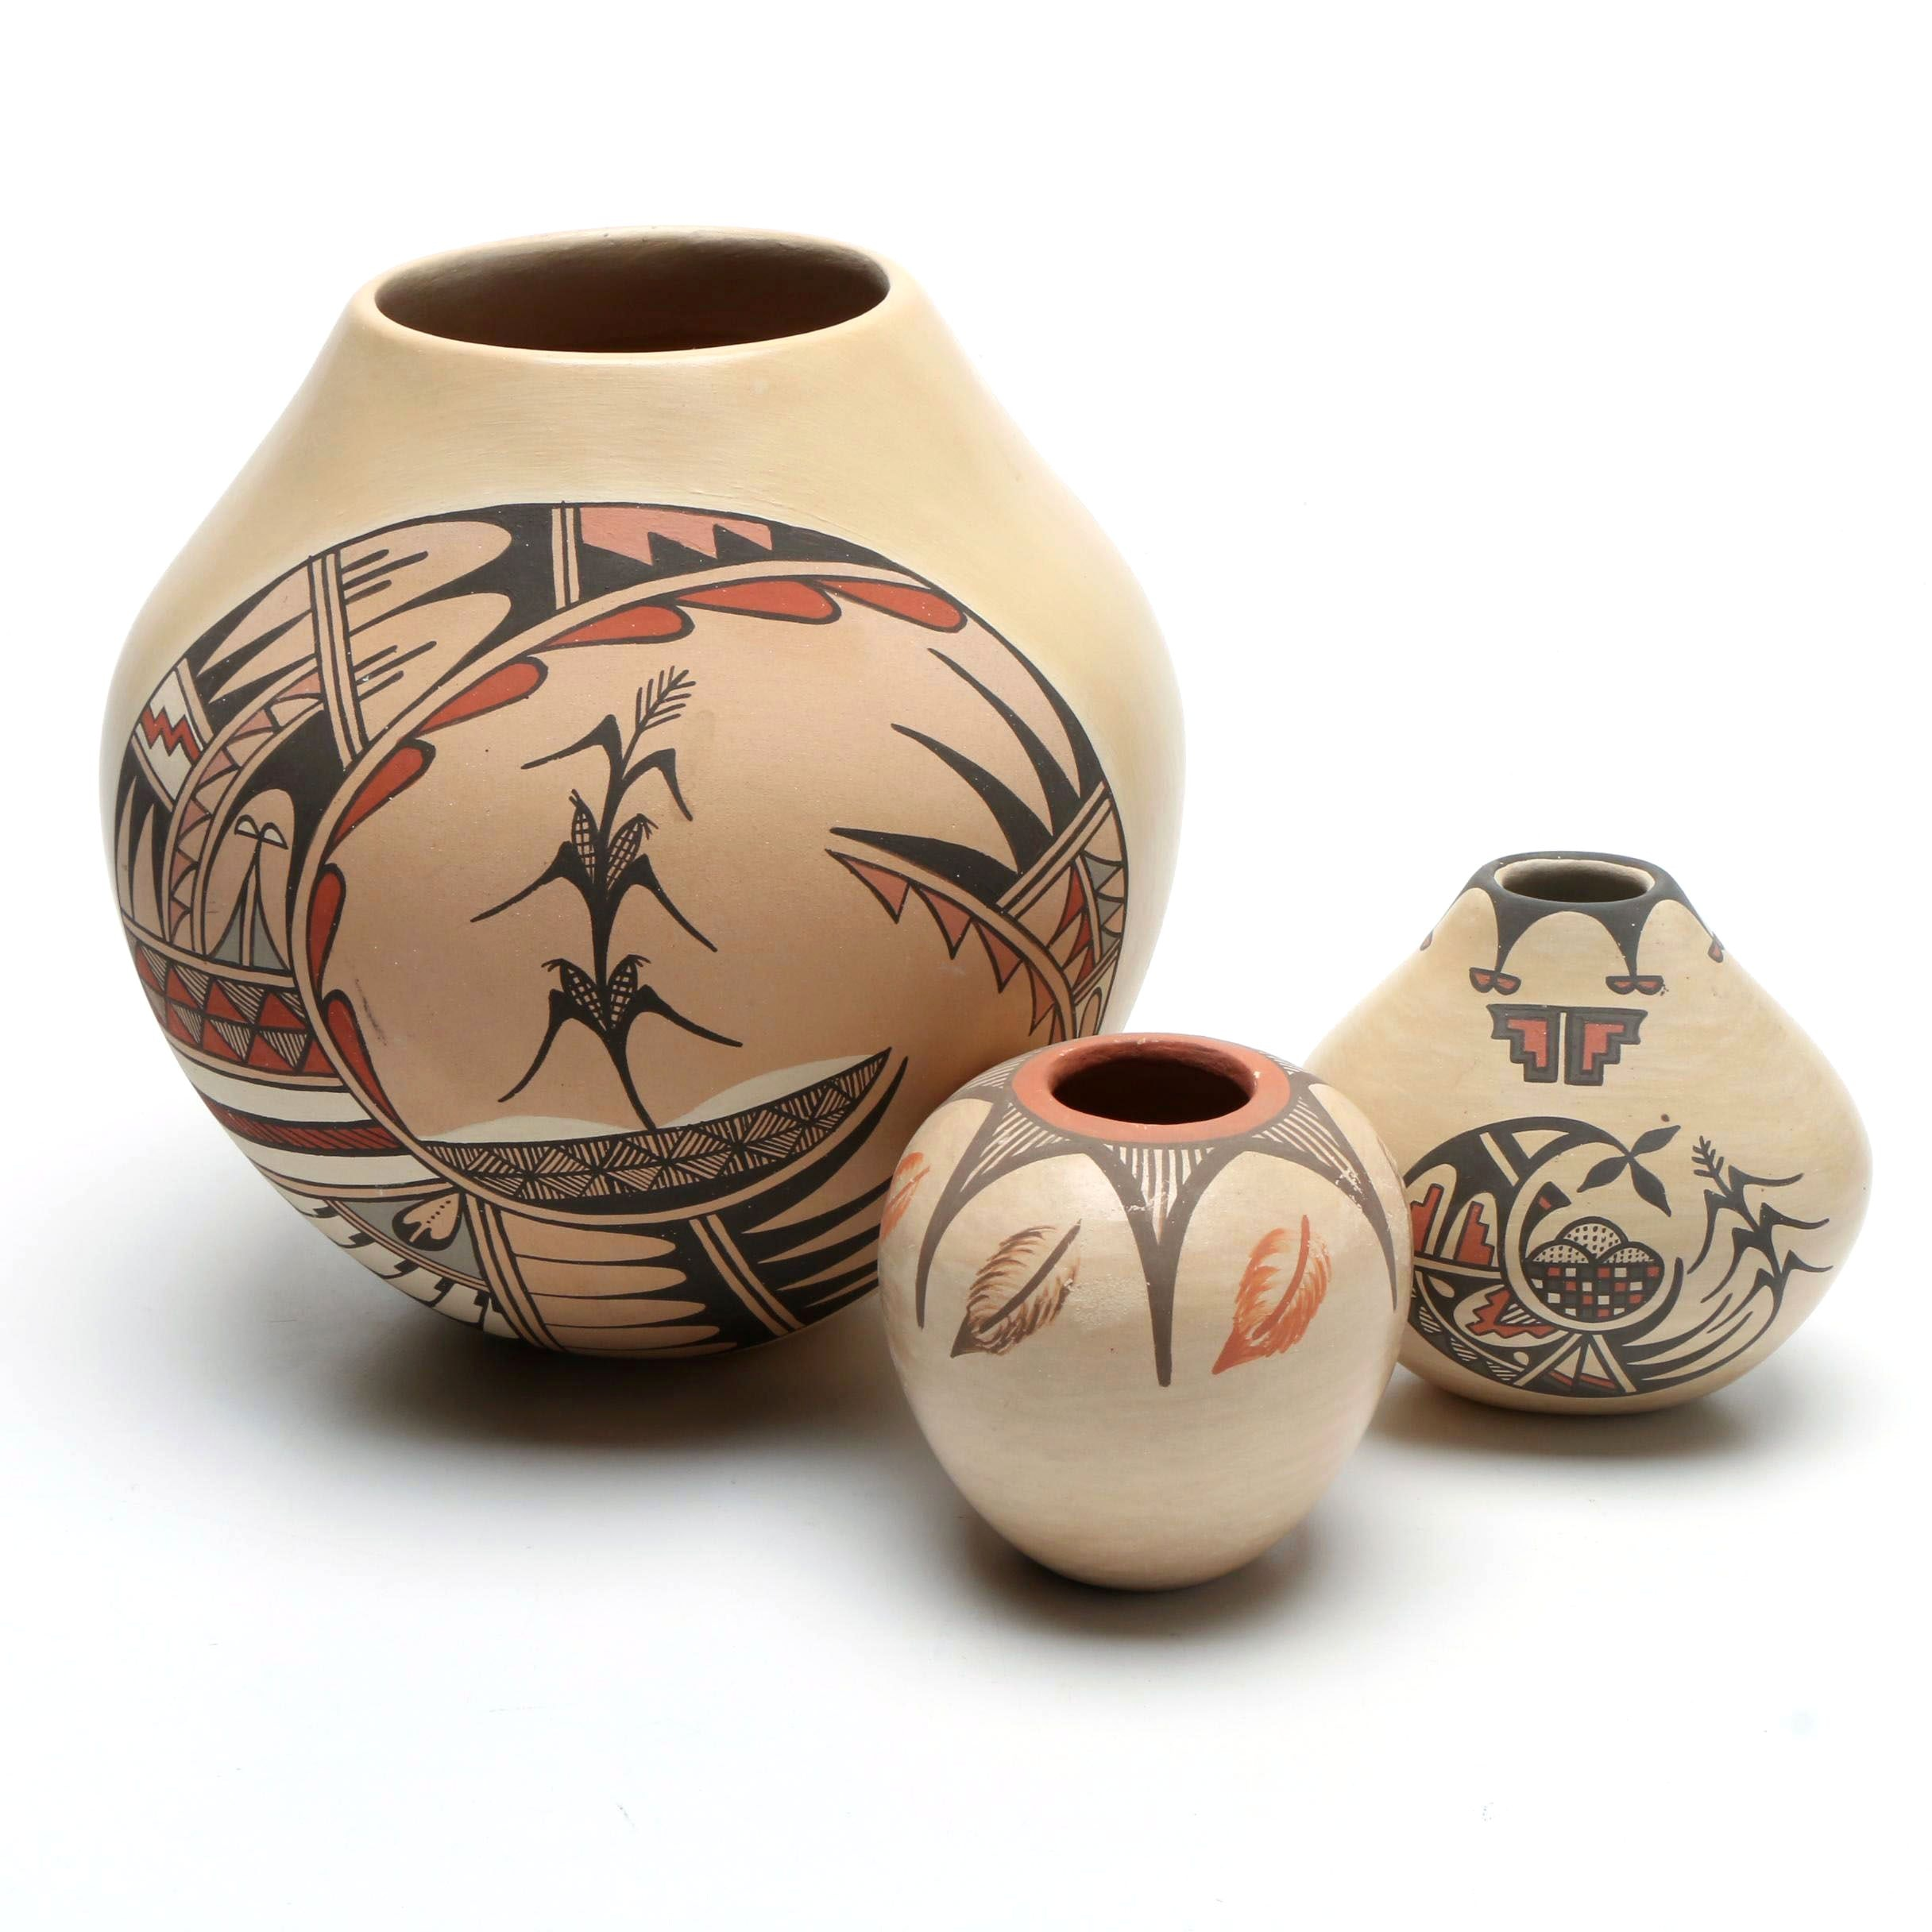 Signed Jemez Pueblo Art Pottery Vases